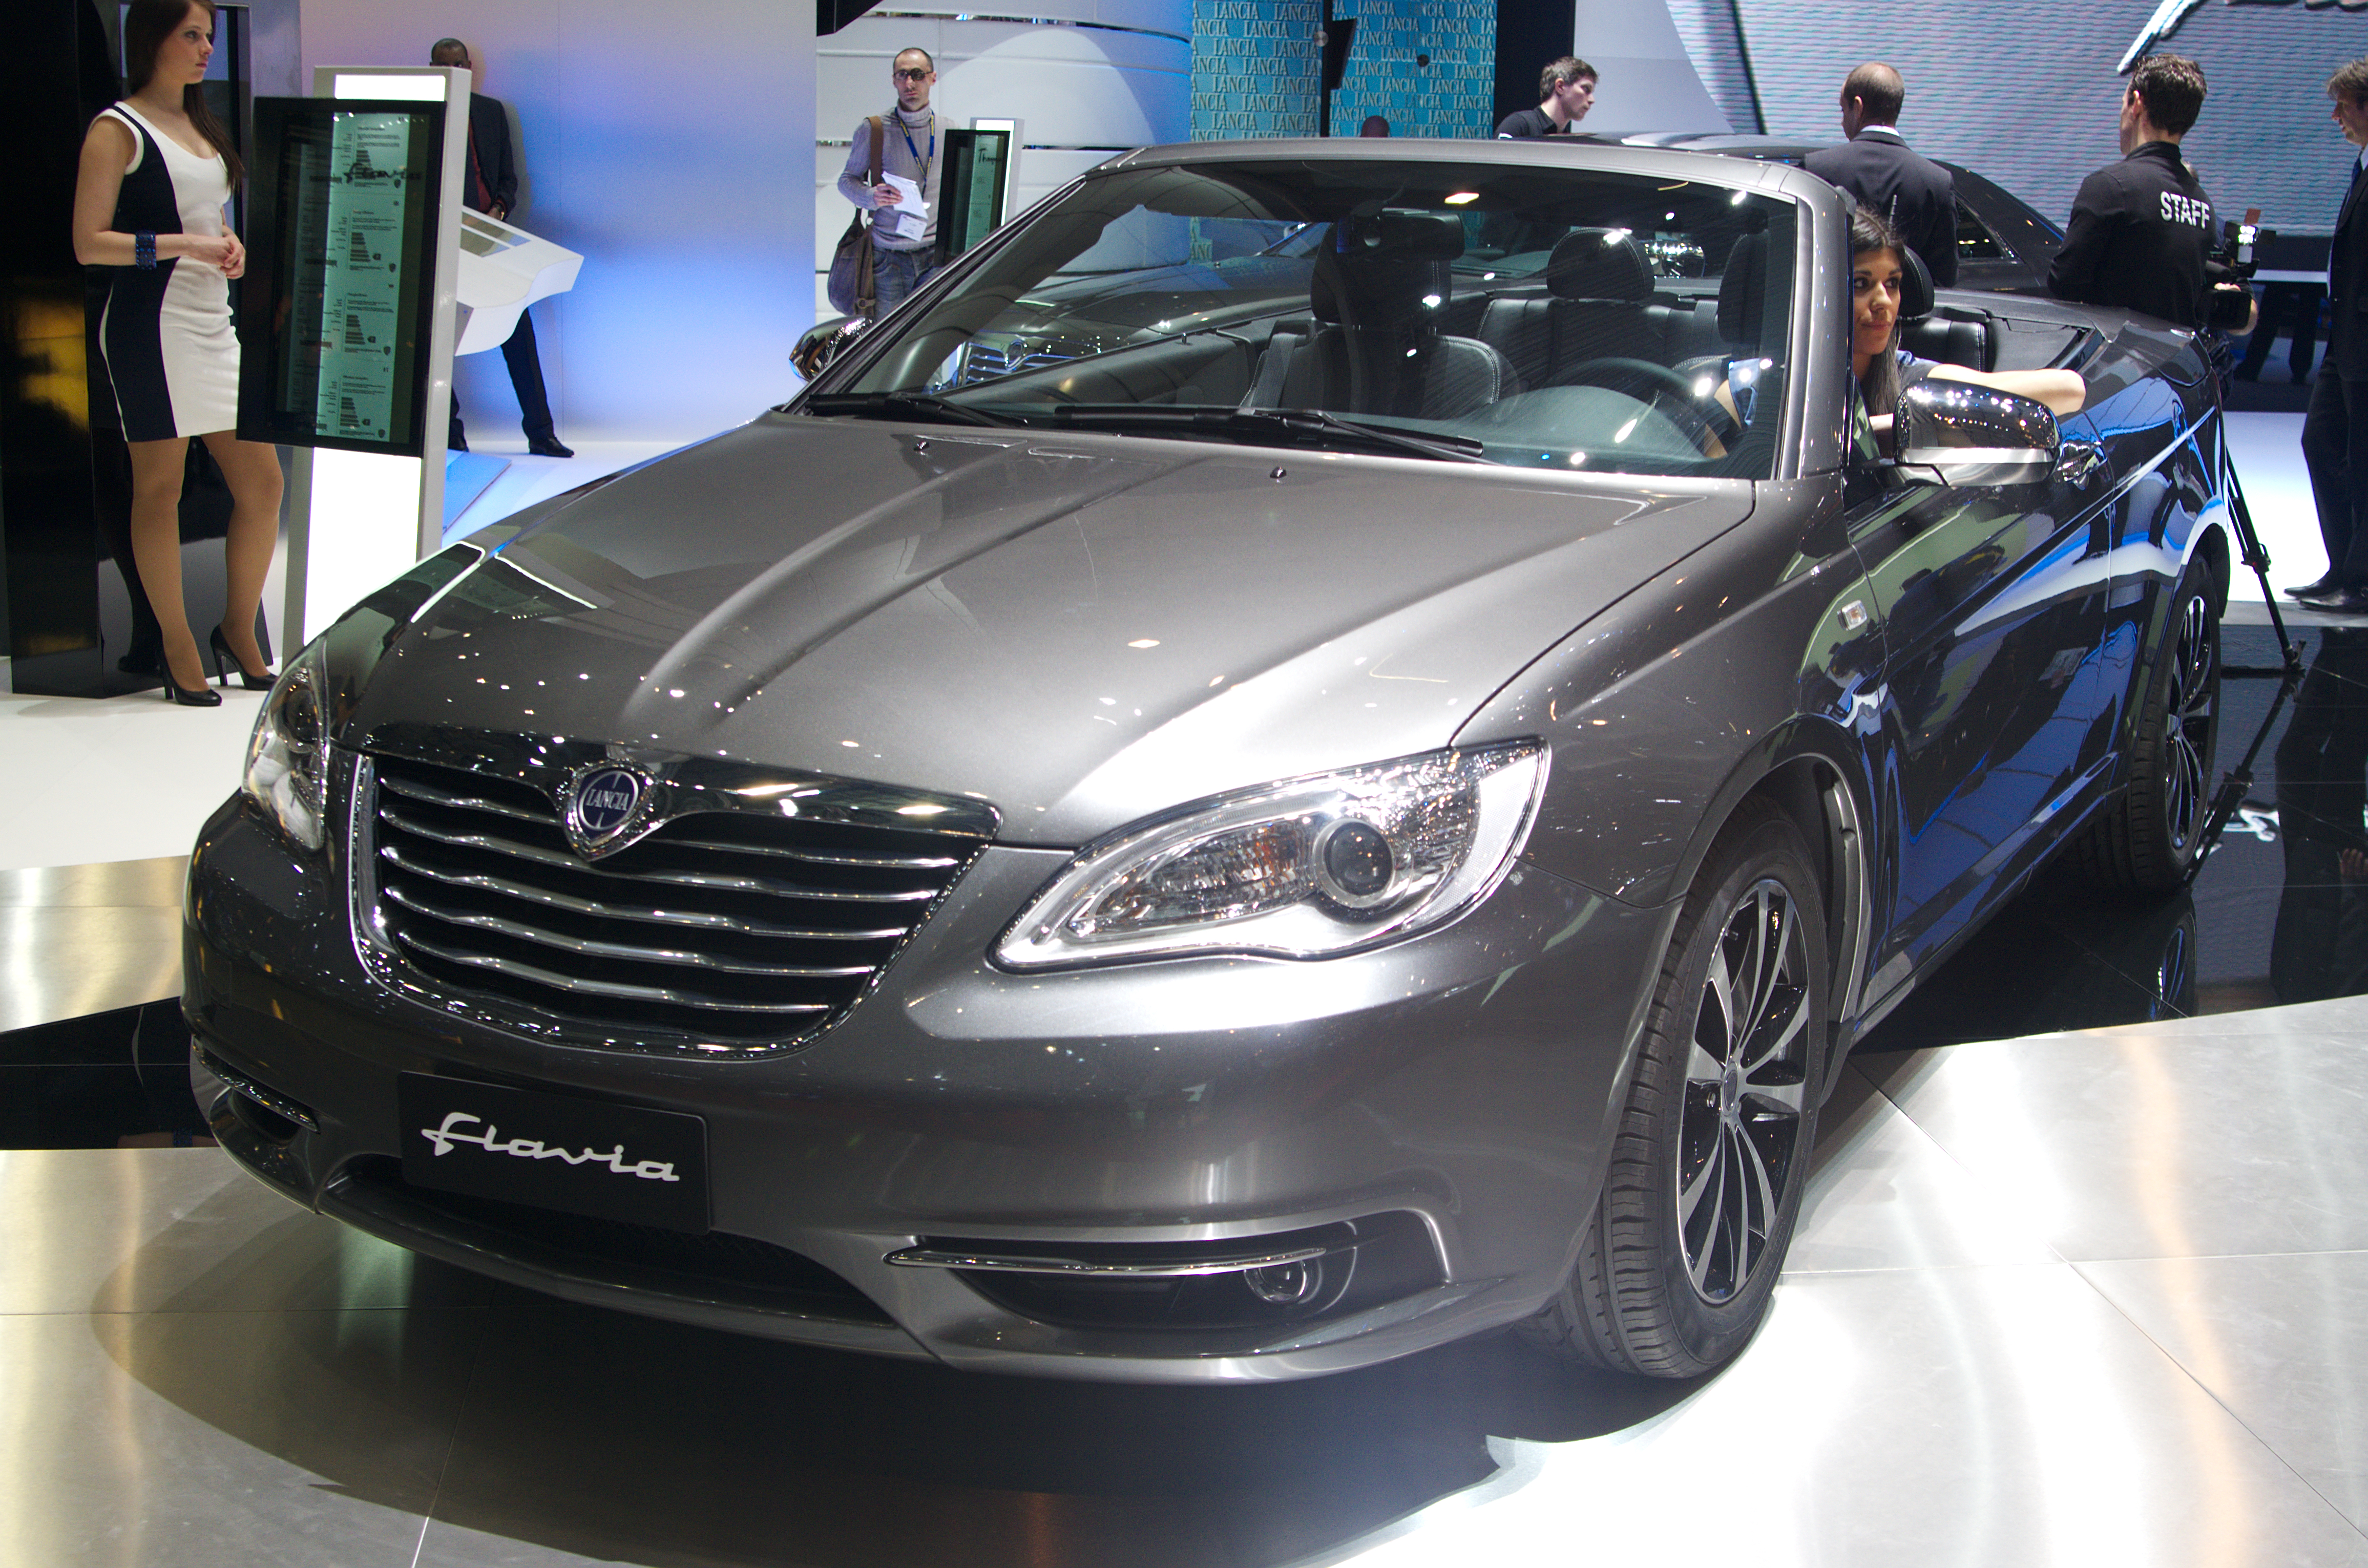 https://upload.wikimedia.org/wikipedia/commons/3/35/Geneva_MotorShow_2013_-_Lancia_Flavia.jpg